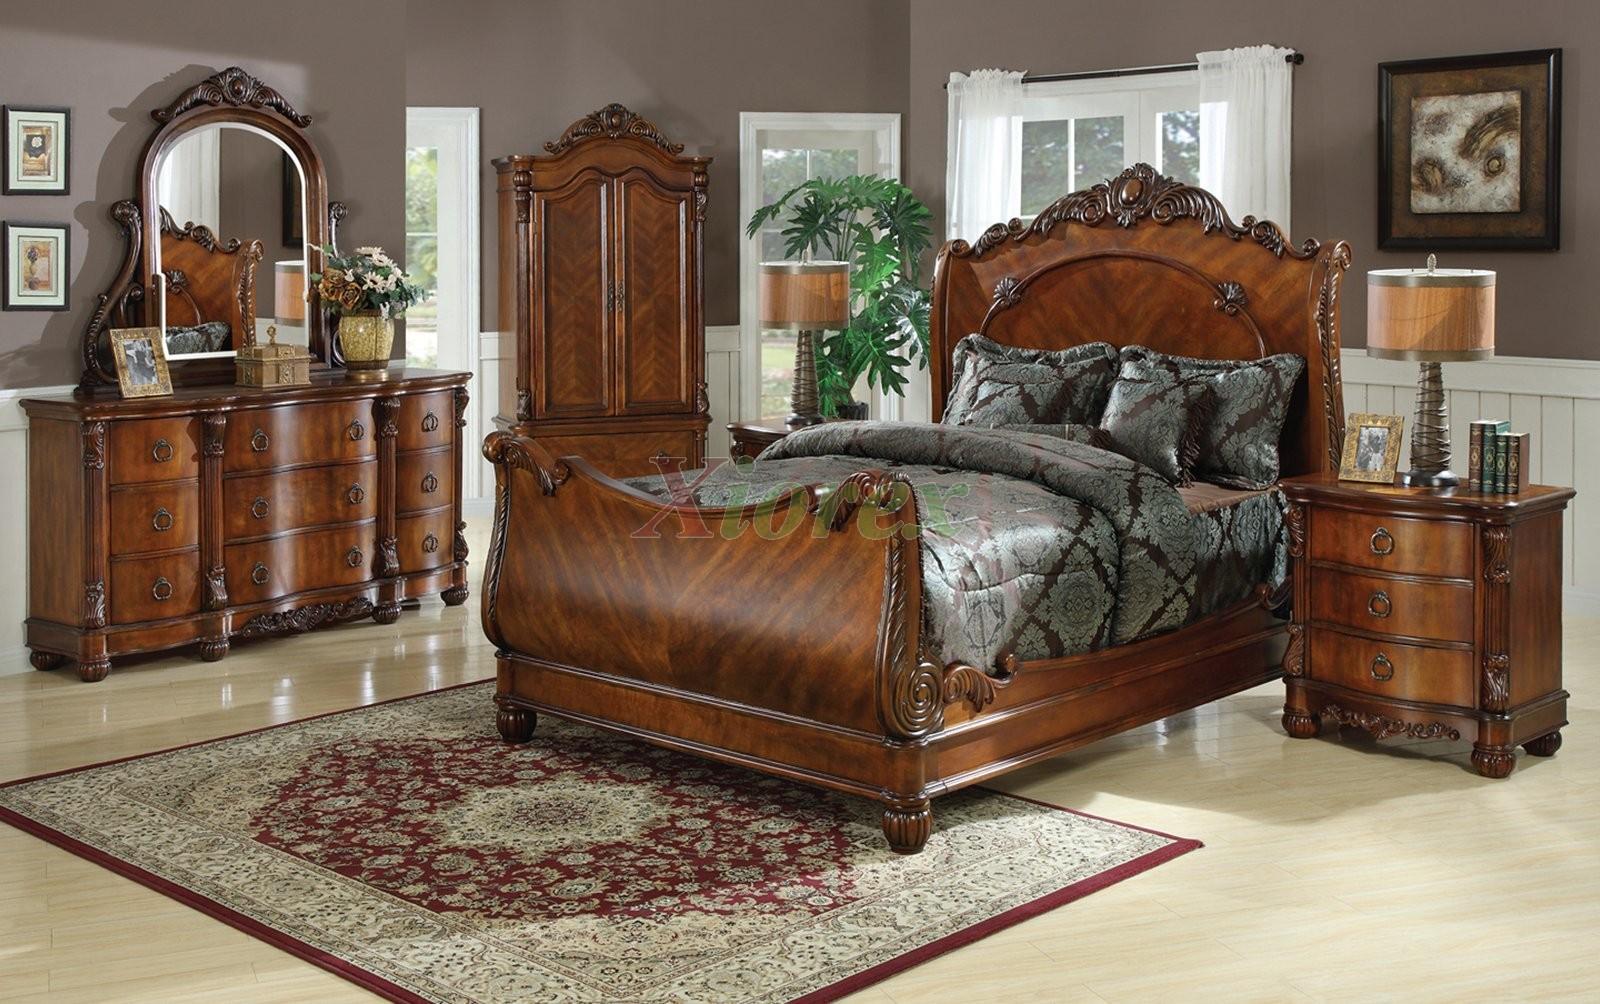 Sleigh Bedroom Furniture Sets Sleigh Bedroom Furniture Set 112 Xiorex